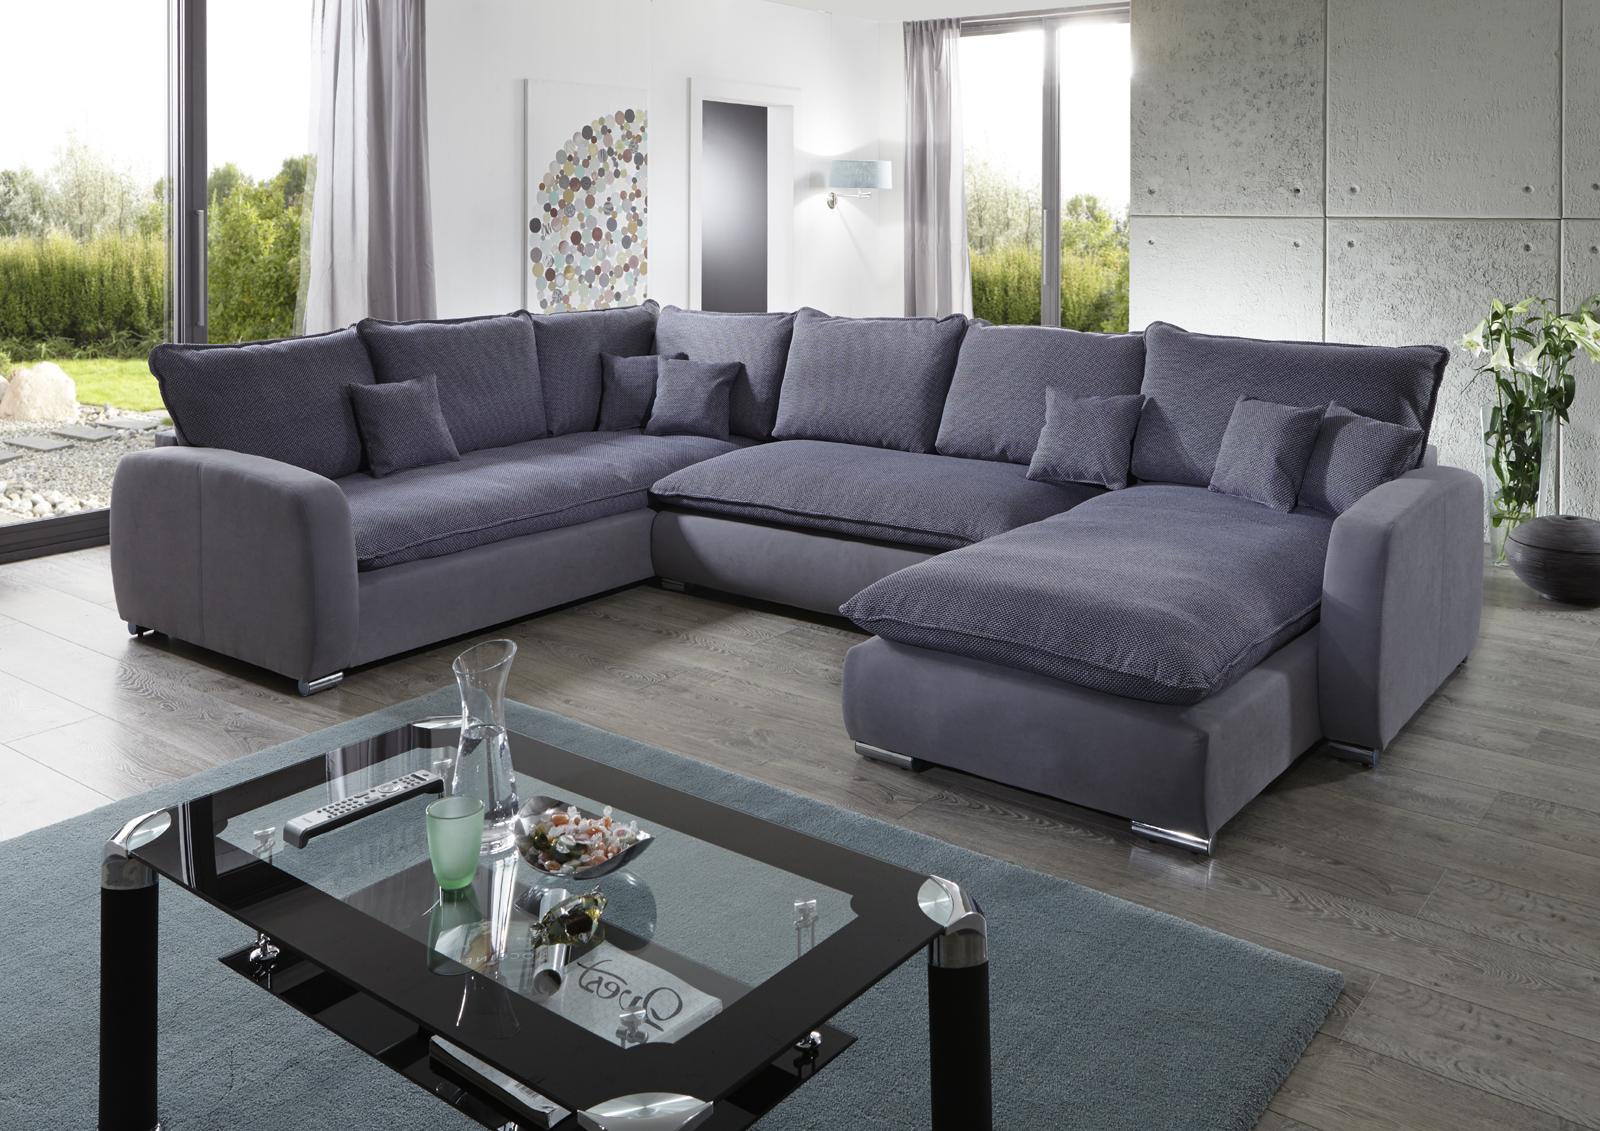 sam sofa grau wohnlandschaft scala 230 cm x 350 x 180 cm. Black Bedroom Furniture Sets. Home Design Ideas